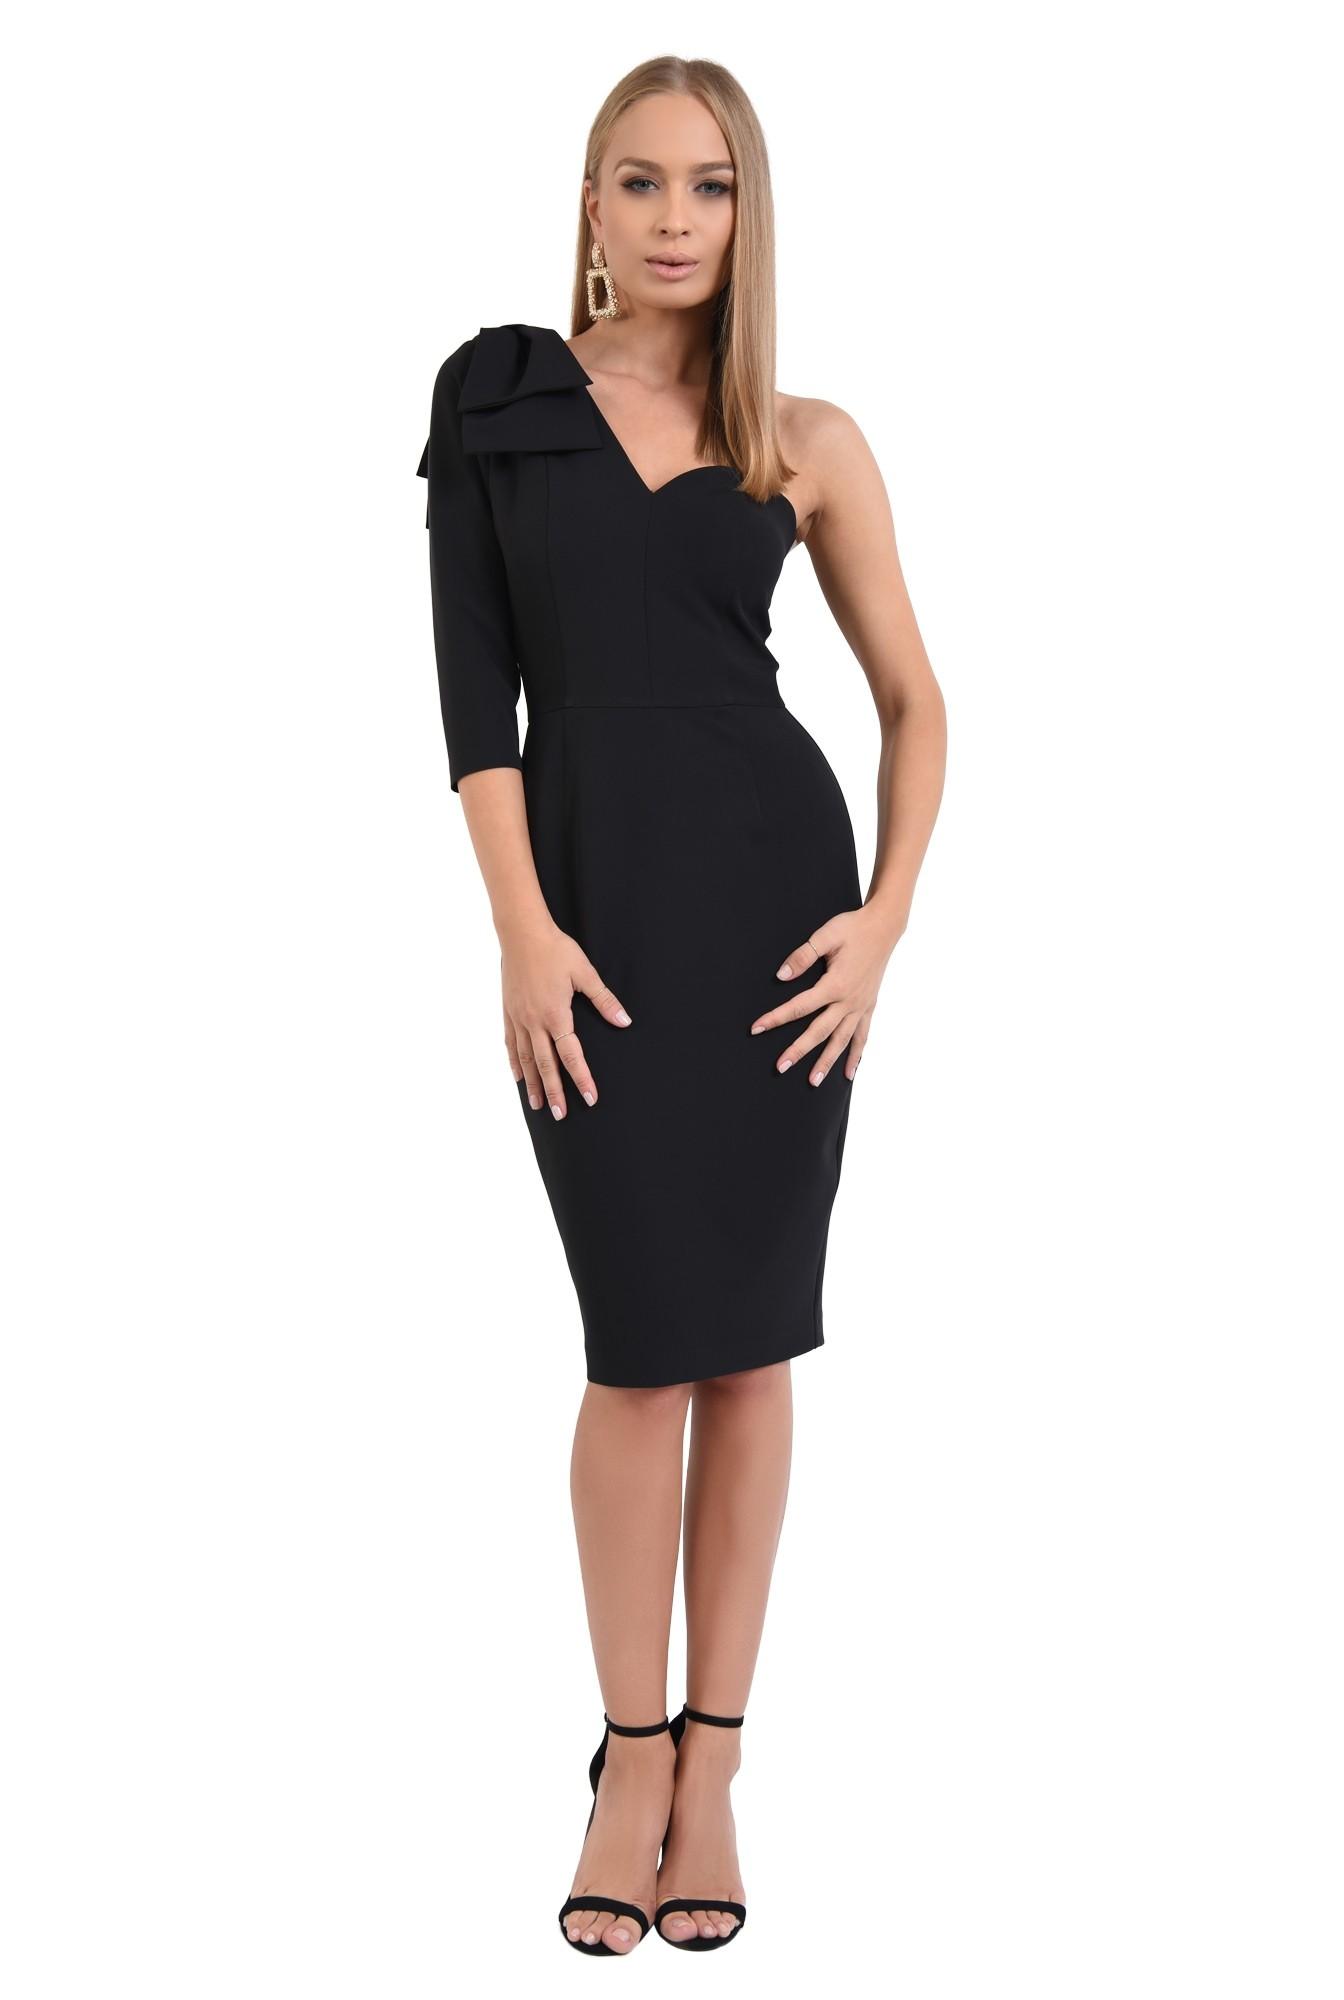 3 - 360 - rochie eleganta, conica, neagra, funda suprapusa la umar